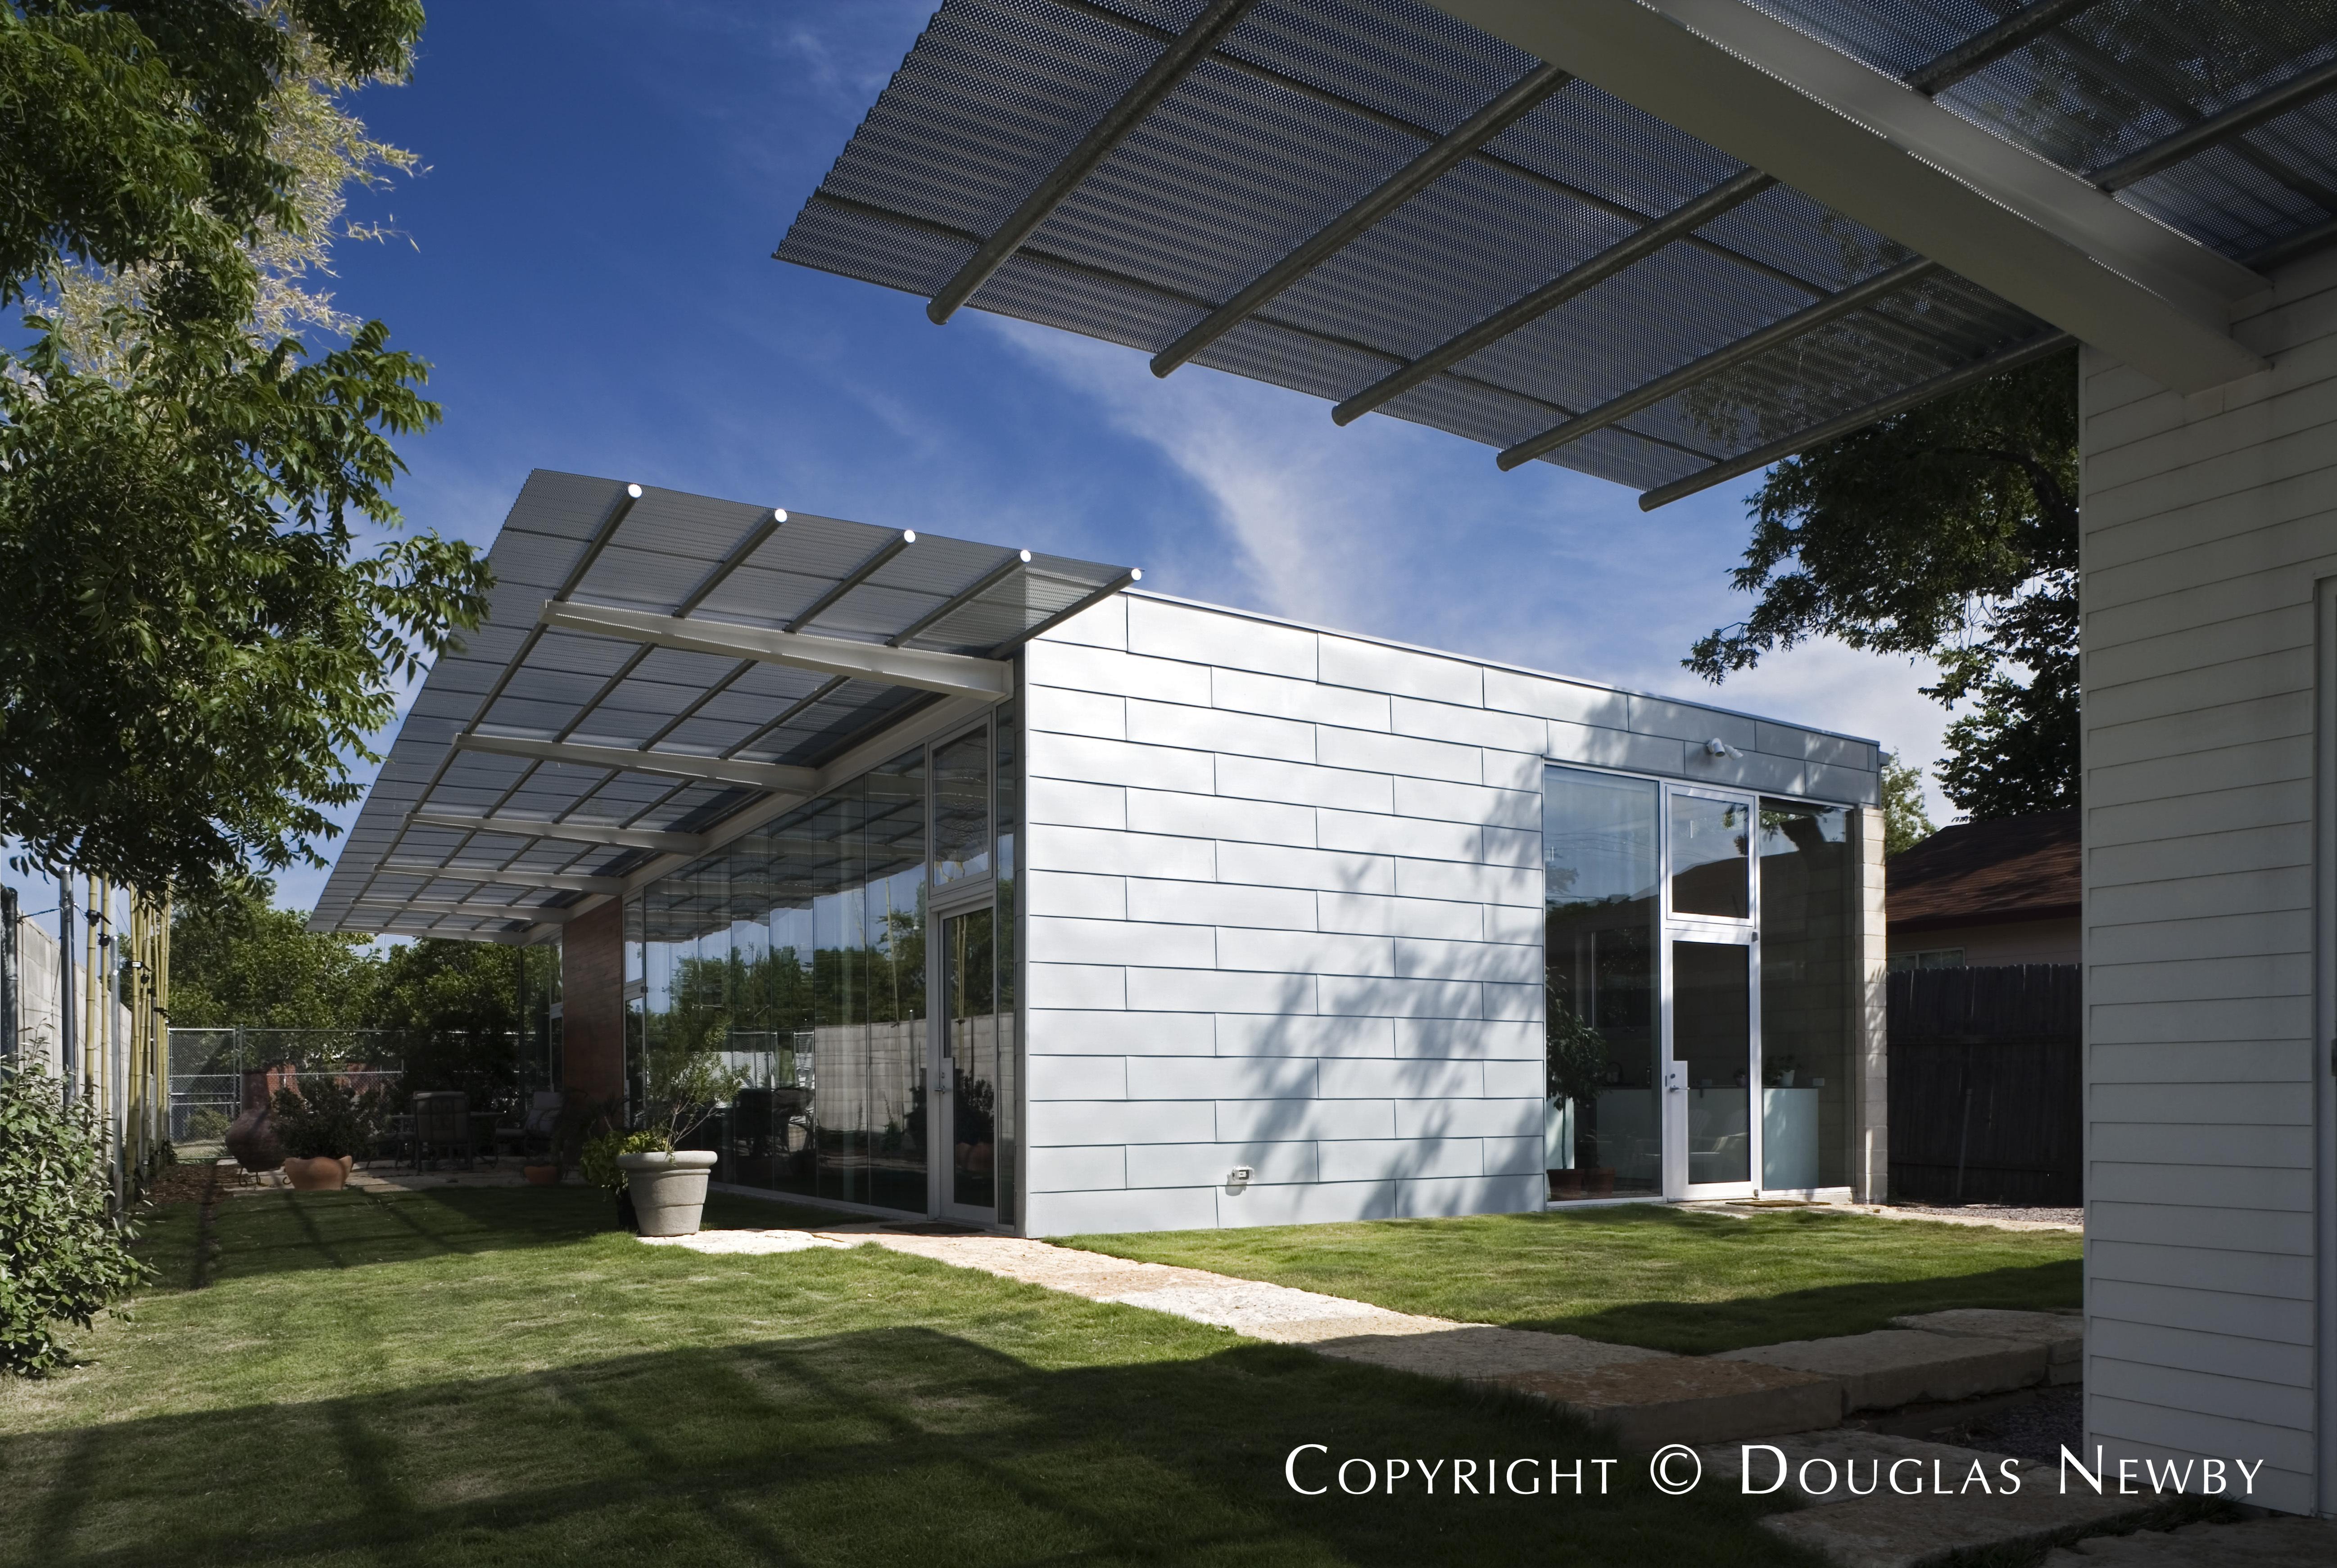 Ron Wommack Dallas Garden House